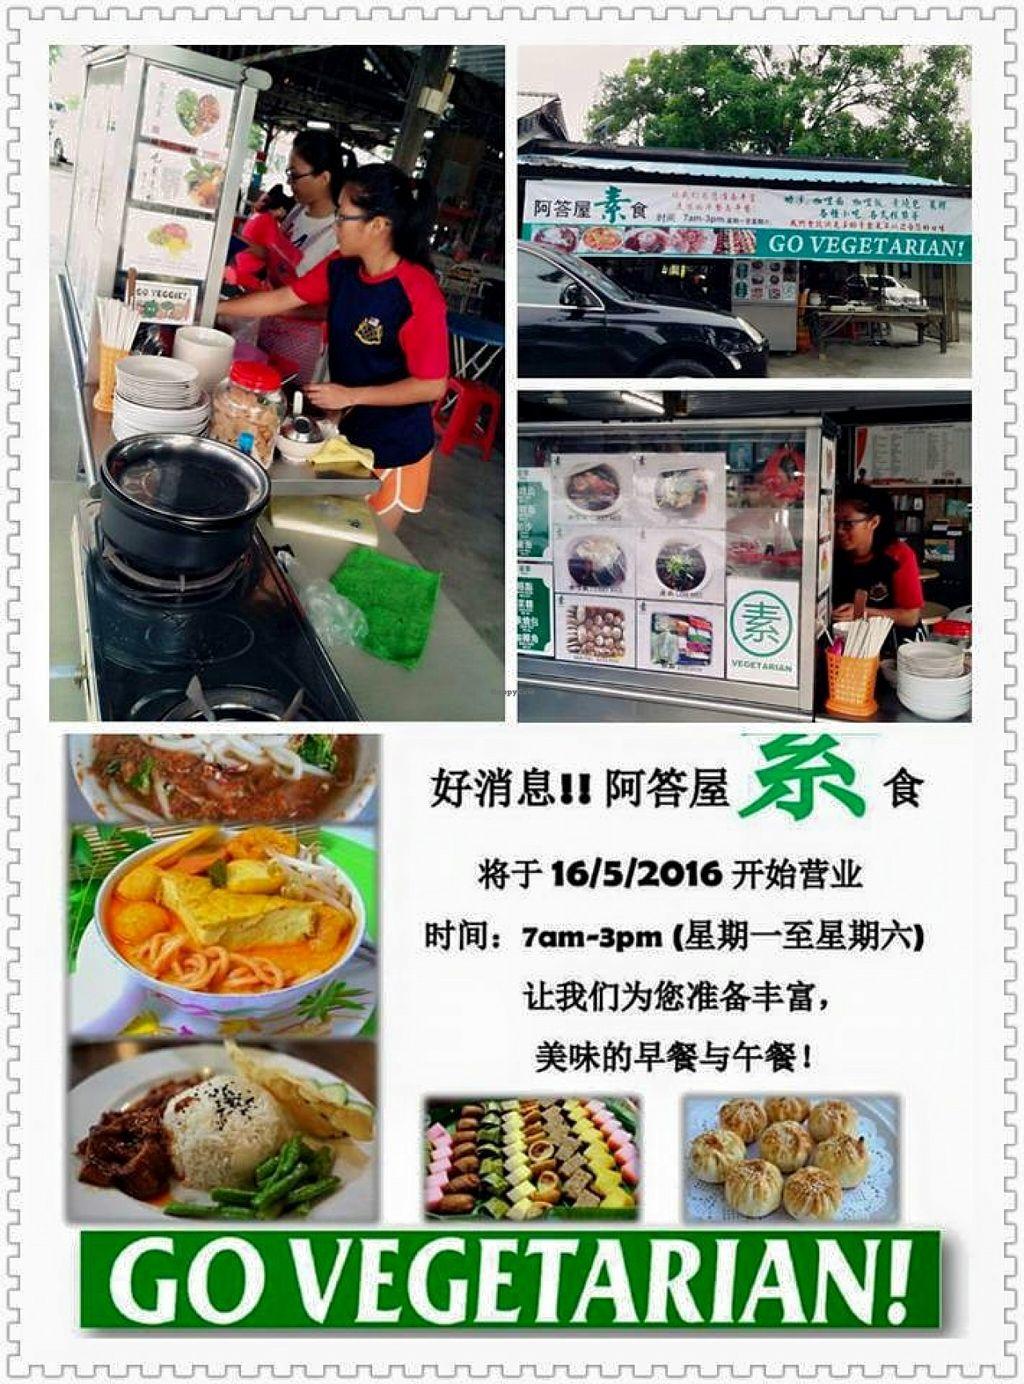 "Photo of Ah Da Wu Vegetarian - Atap Kopitiam  by <a href=""/members/profile/francischeang"">francischeang</a> <br/>No egg no garlic and no onion. (Beside tambun caltex) <br/> May 19, 2016  - <a href='/contact/abuse/image/73907/149758'>Report</a>"